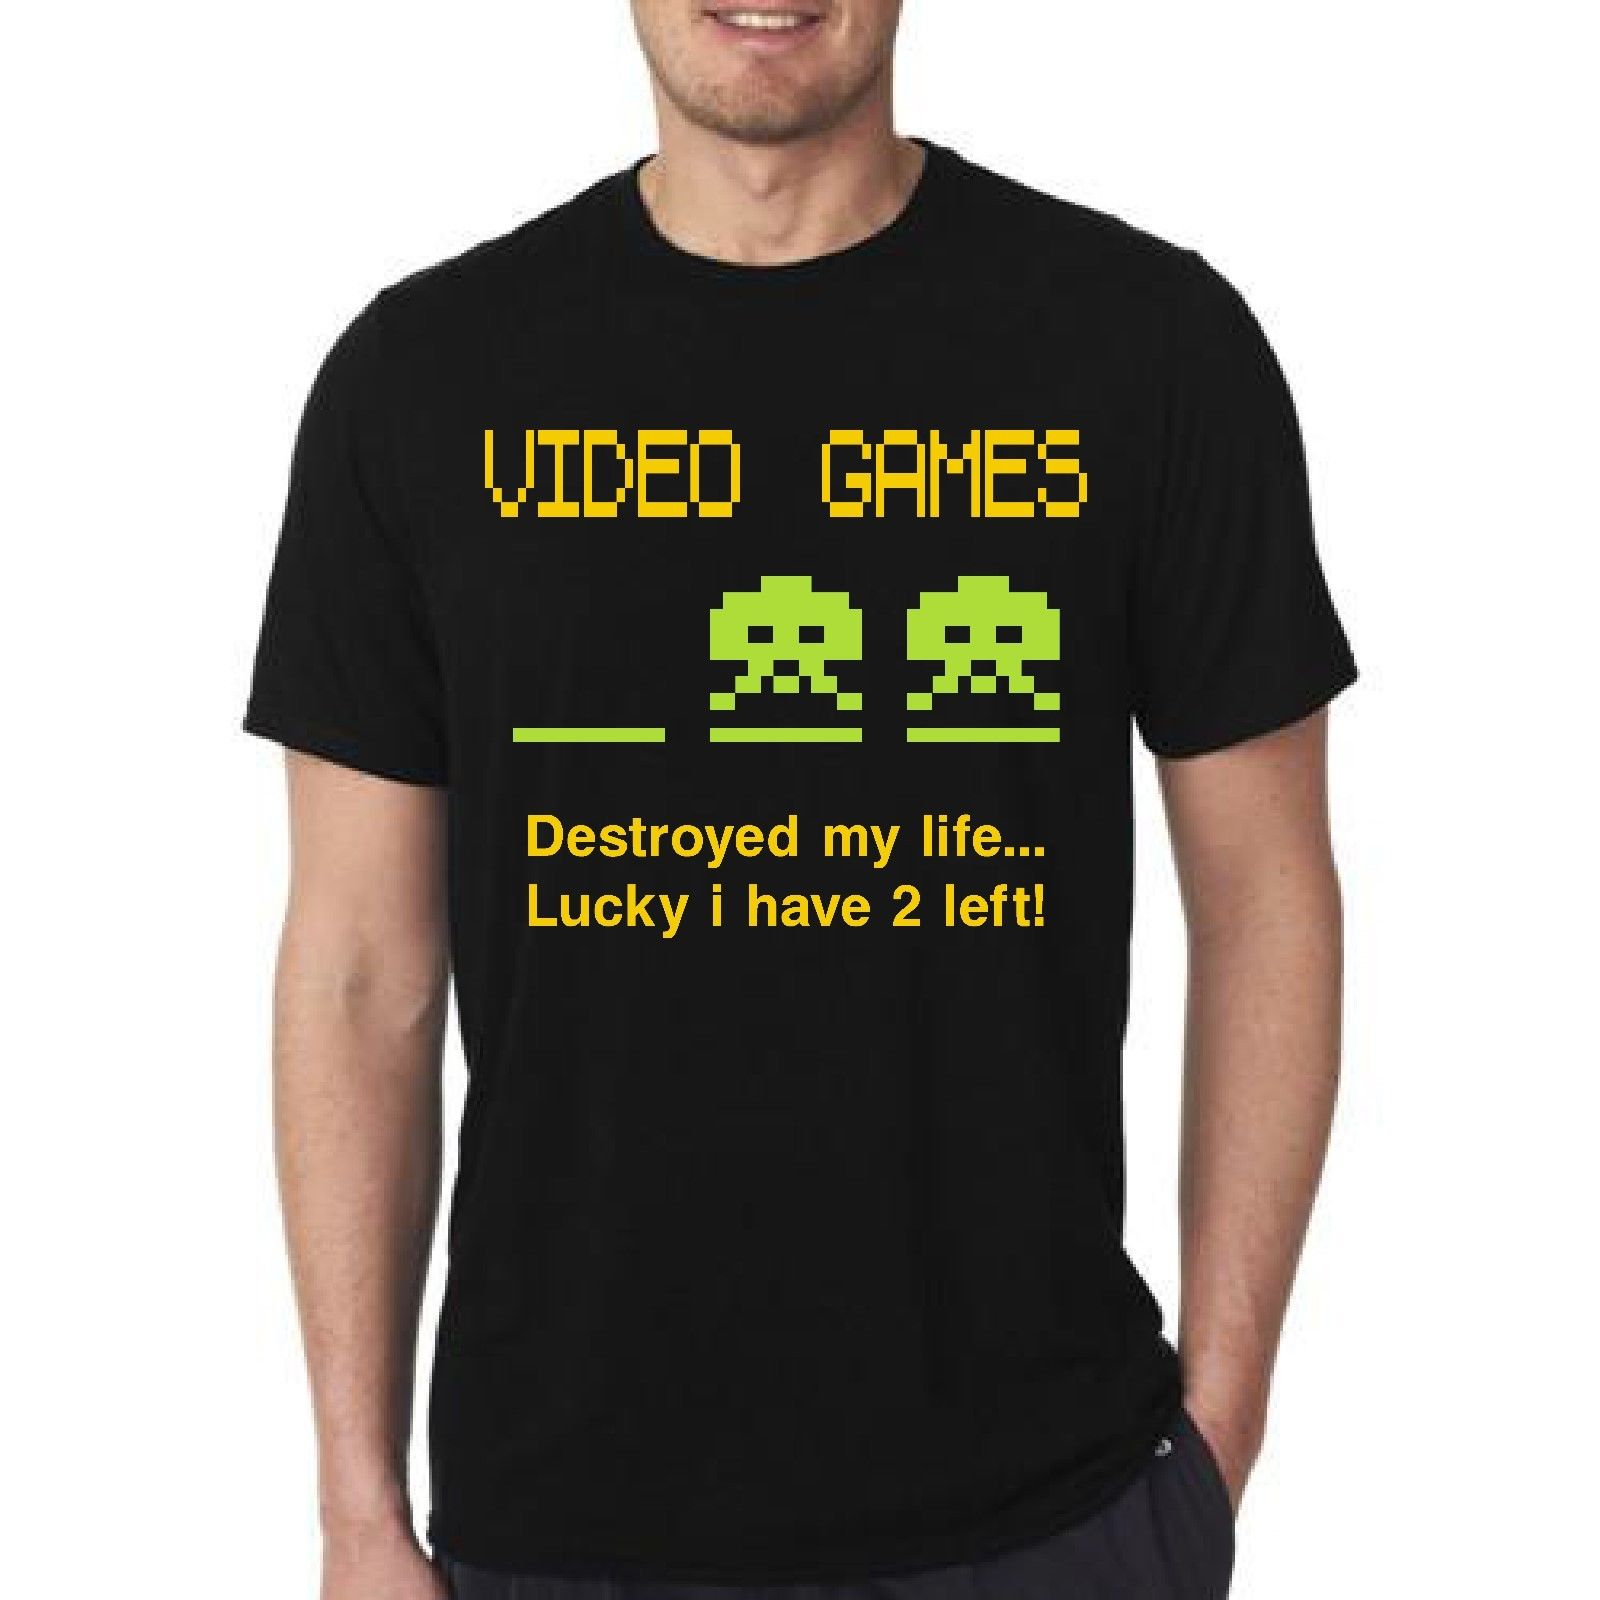 Cotton Shirts Cheap Wholesale VIDEO GAMES DESTROED MY LIFE T-SHIRT